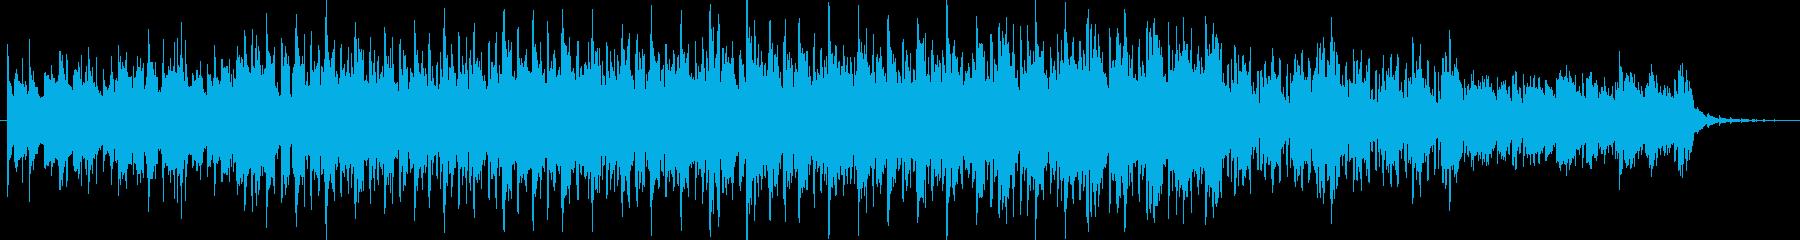 YouTube  配信のBGM CM他の再生済みの波形